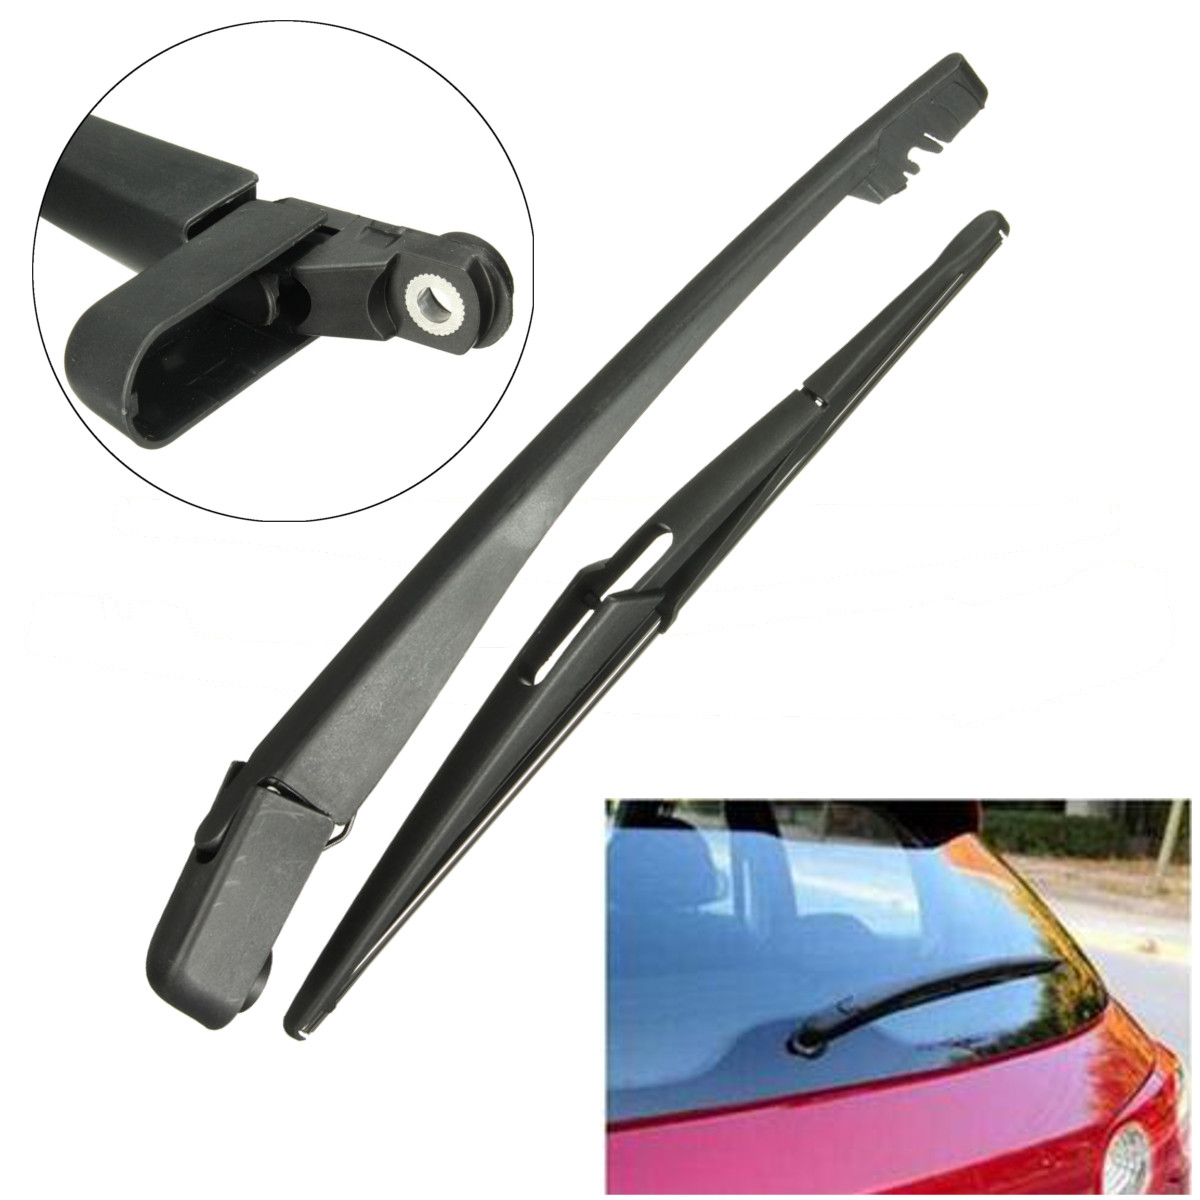 2Pcs/Set Rear Window Windshield Wiper Blade&Arm Set For VAUXHALL OPEL CORSA D MK4 2006 2007 2008 2009 2010 2011 2013 2013